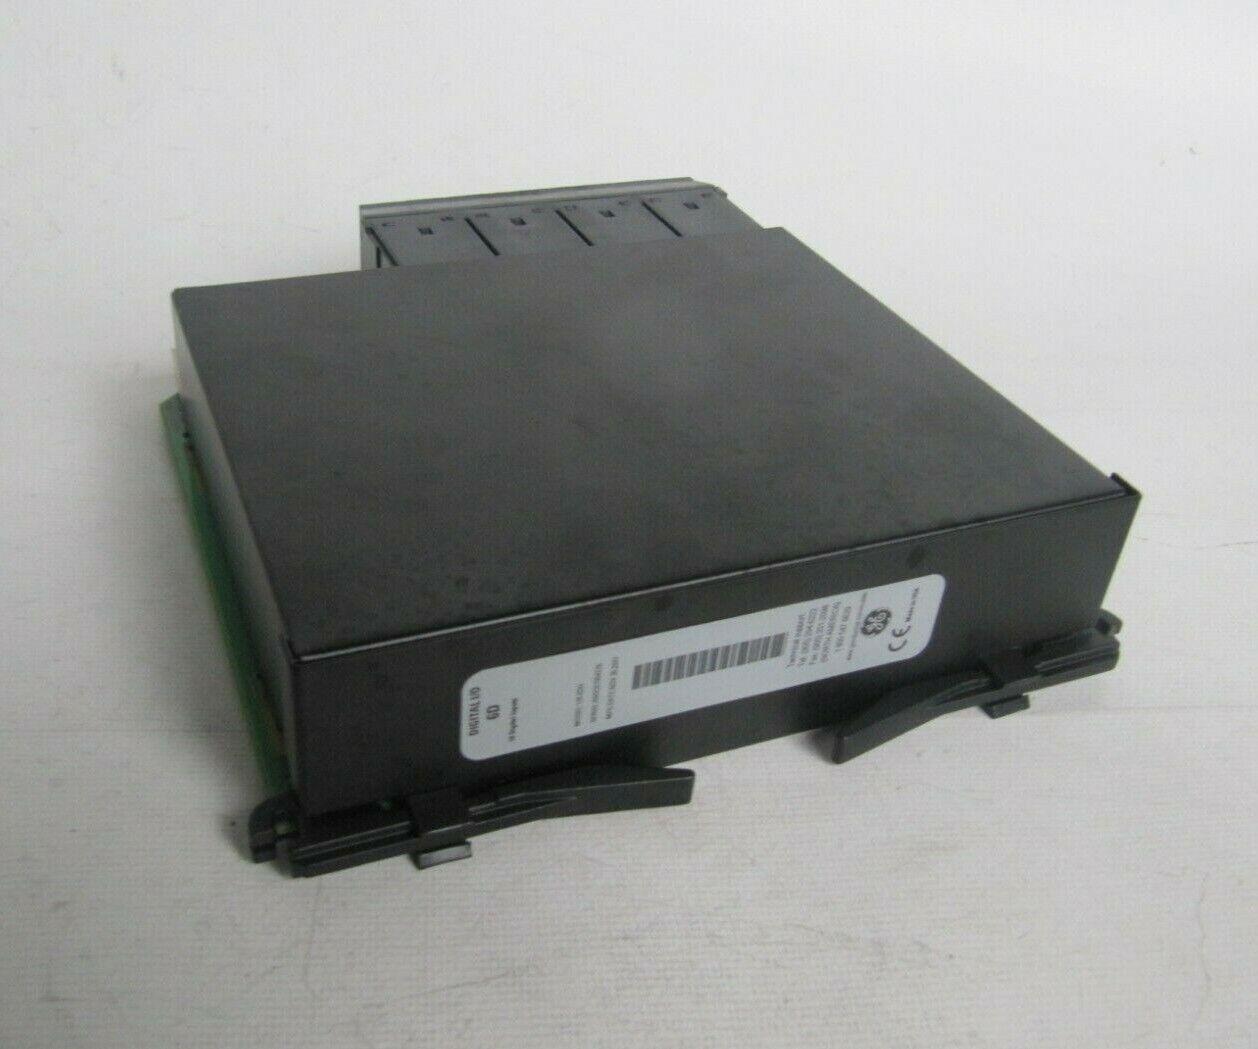 GE Multilin 6D Digital I O Module 14 Digital Inputs UR 6DH UR6DH